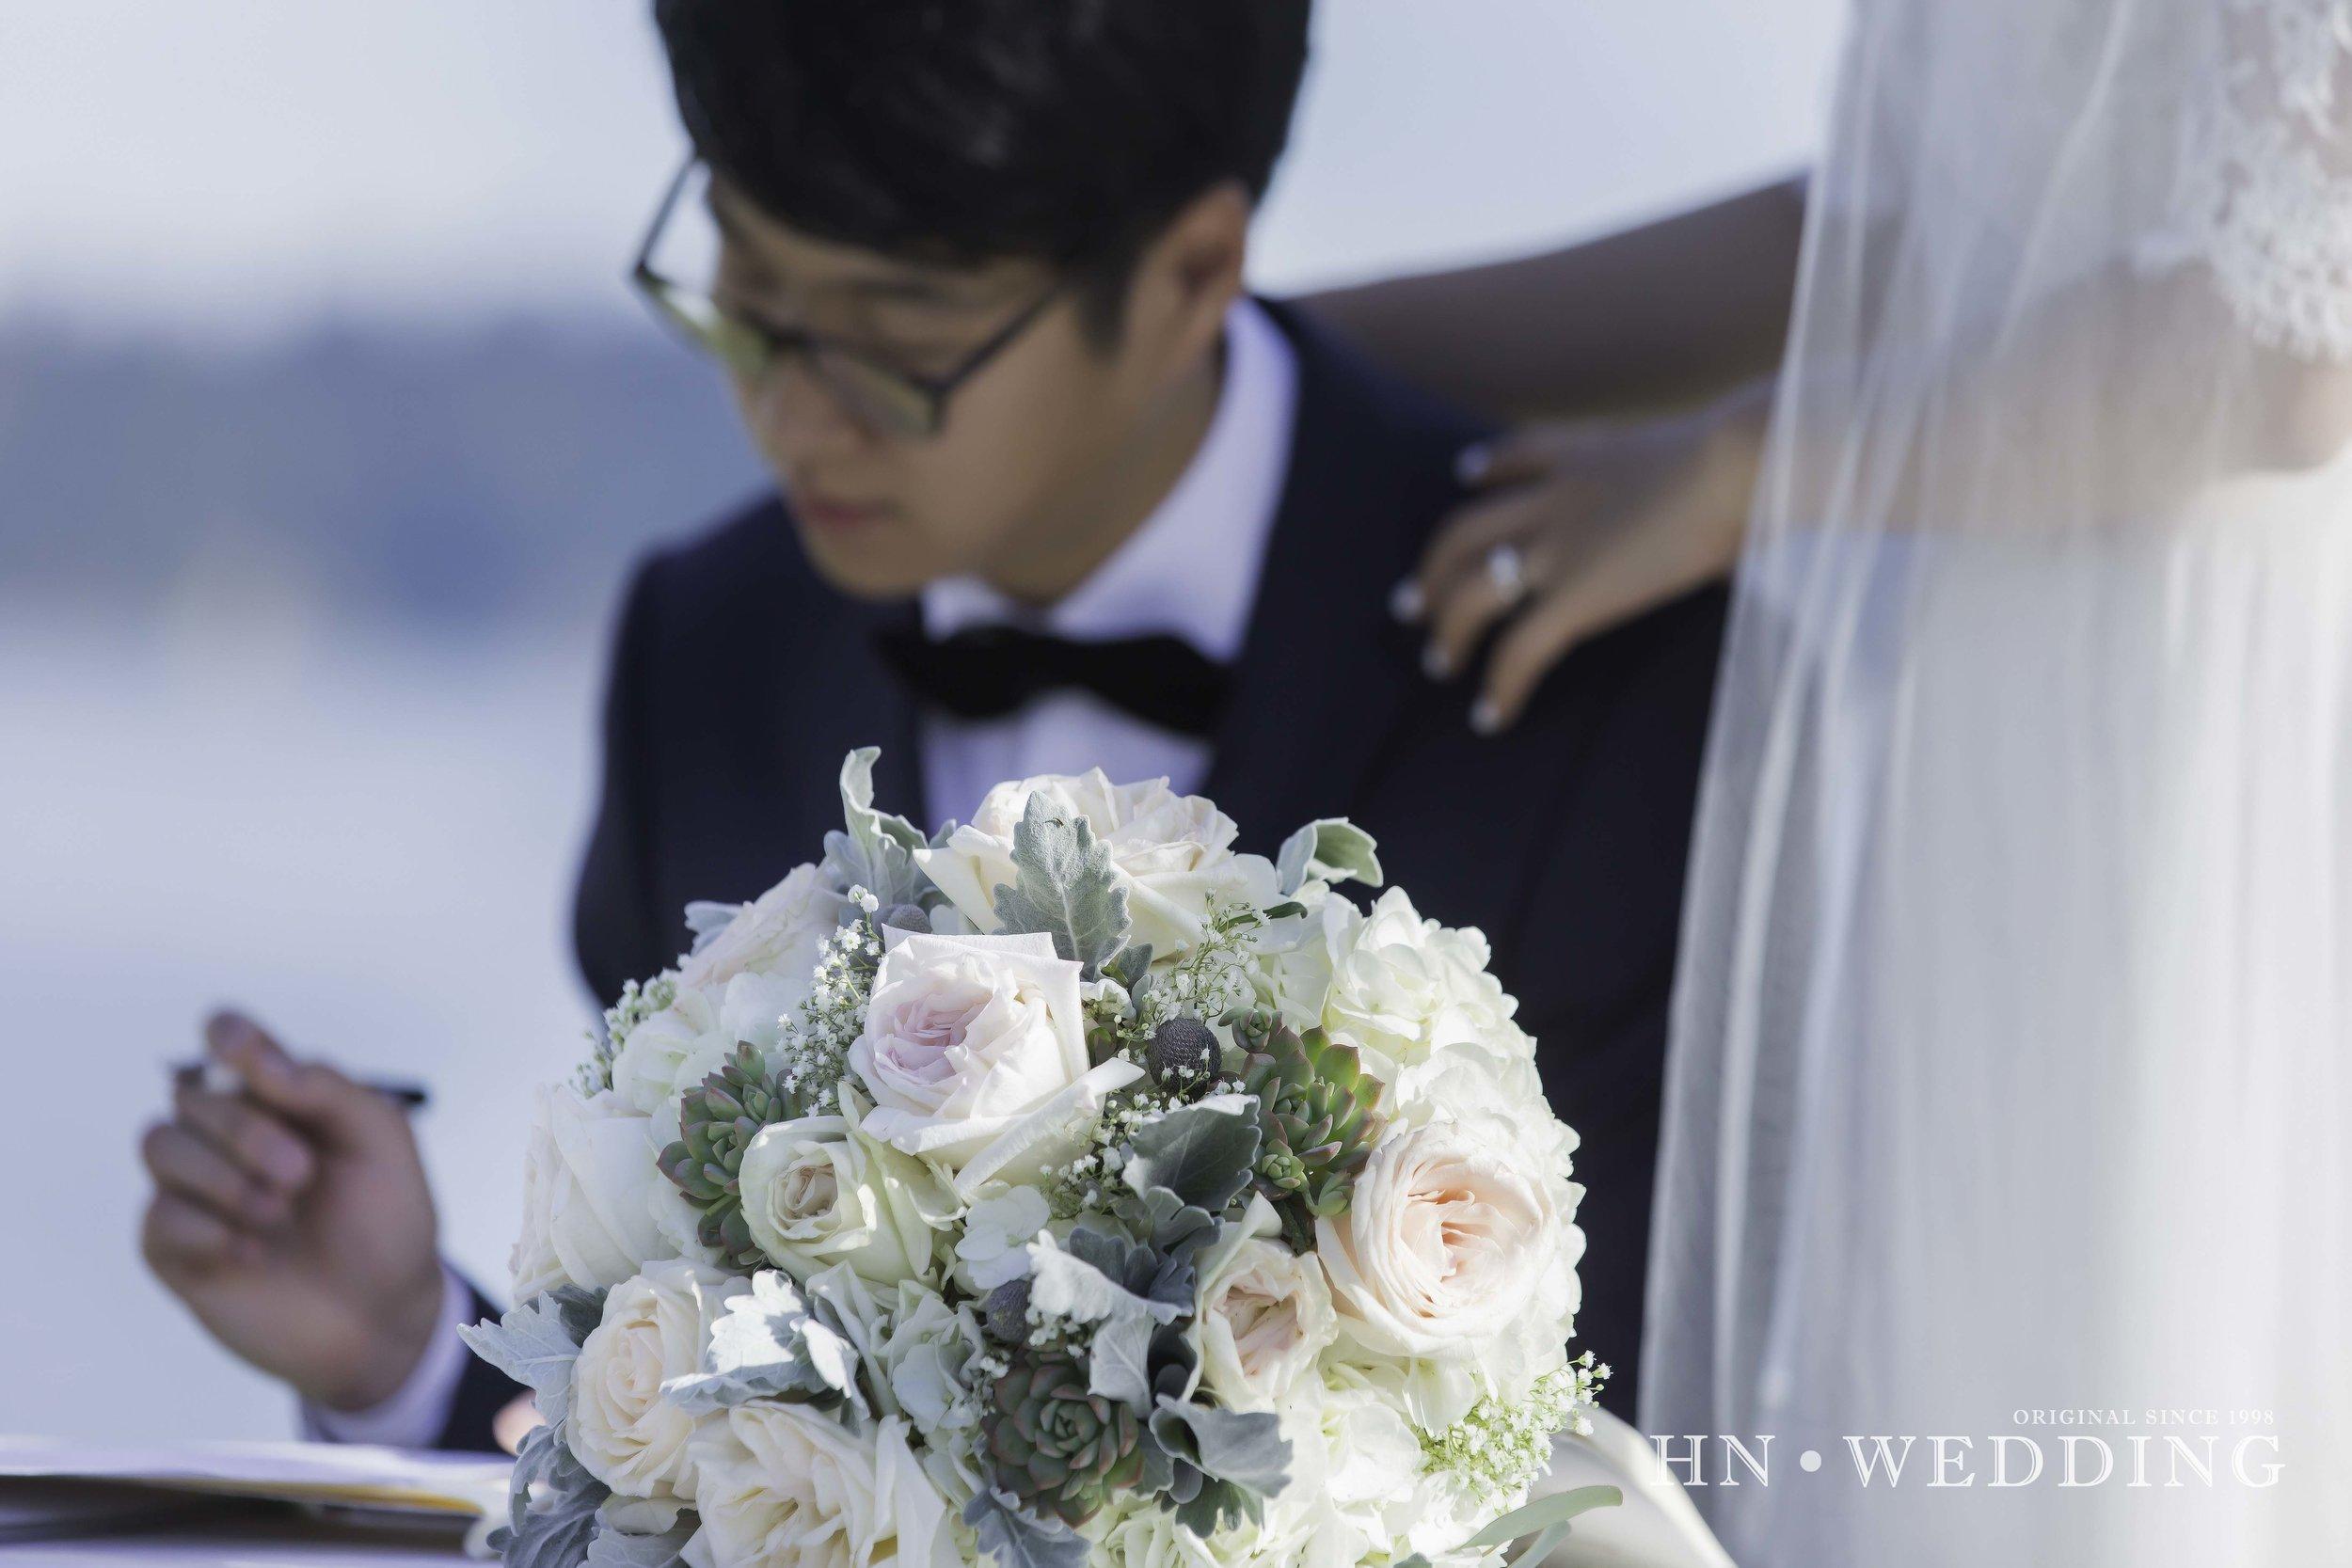 HNwedding-20160826-wedding-1904.jpg